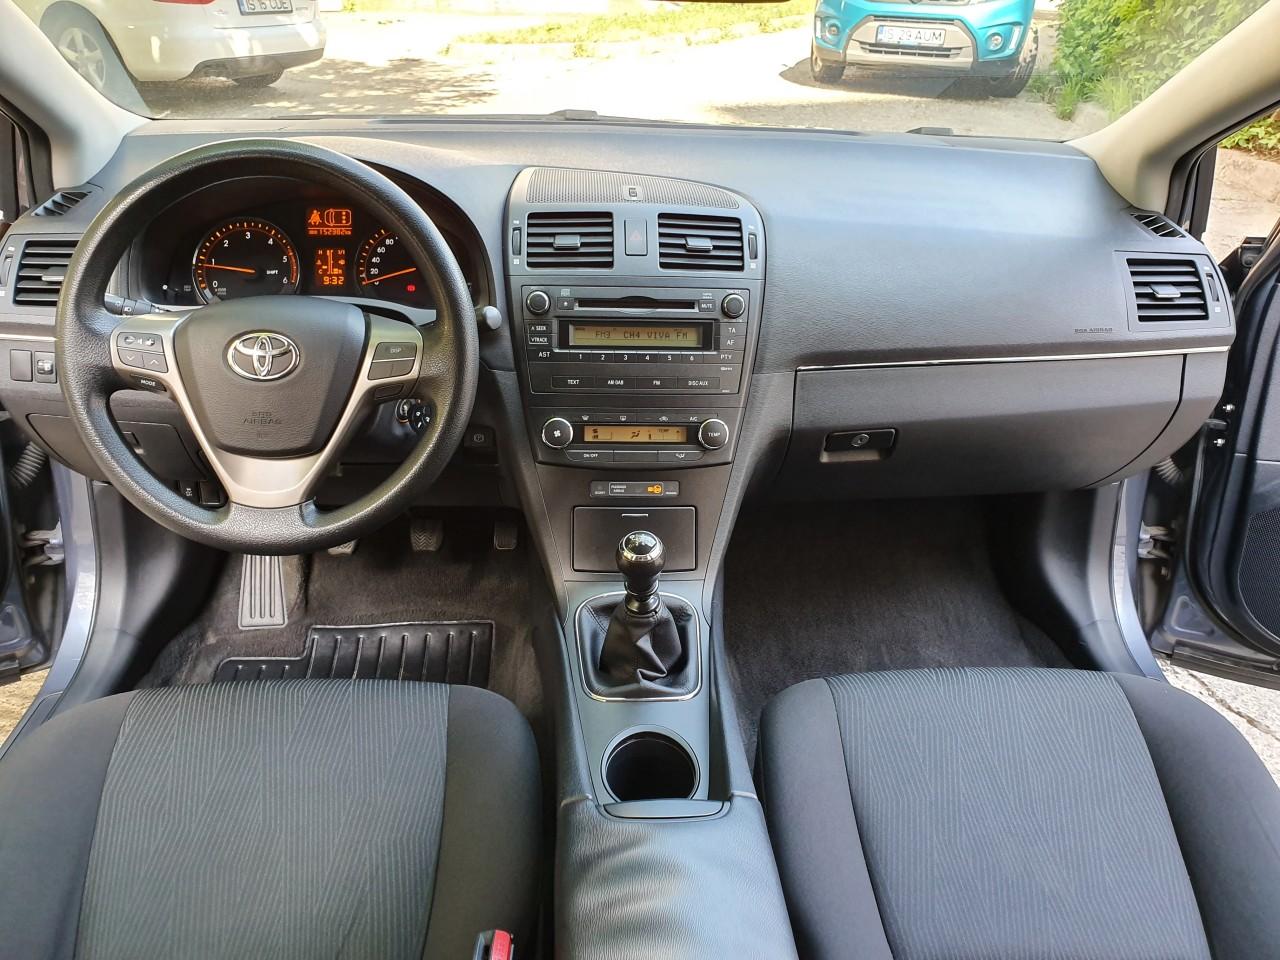 Toyota Avensis Executive 2.0 D4D 136 cp 6+1 trepte 2009